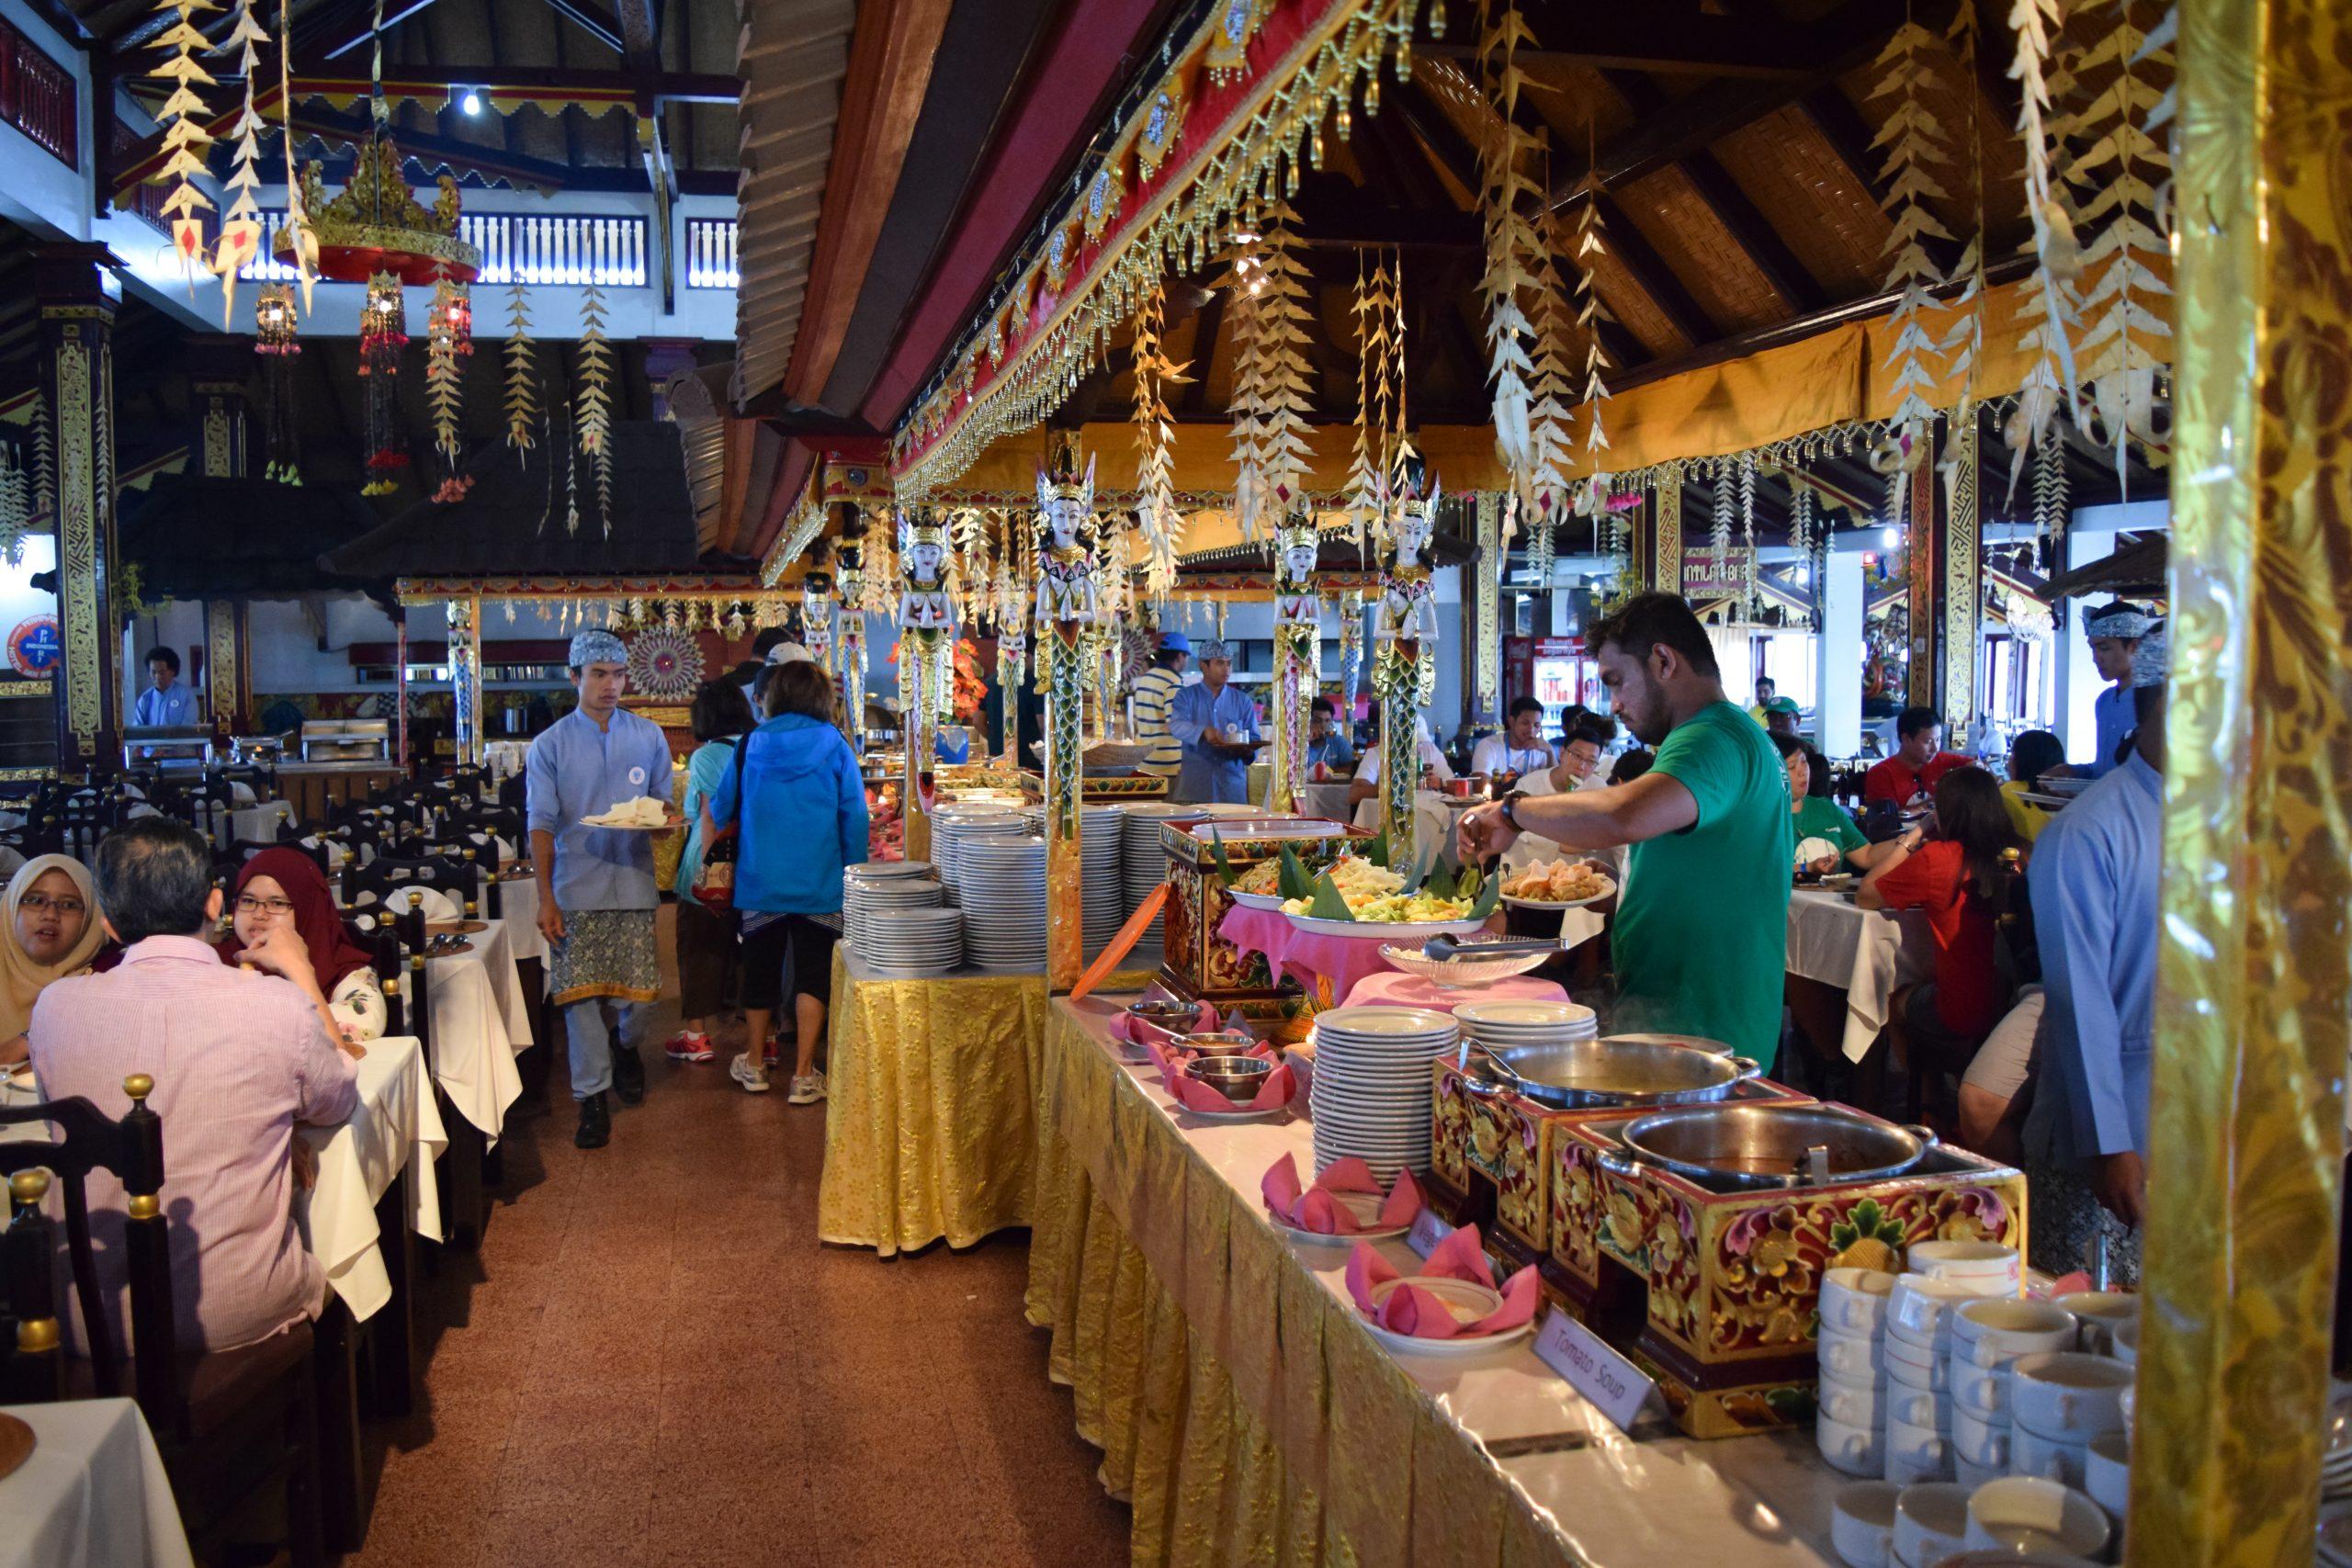 Food Stall at Kintamani Restaurant, Bali